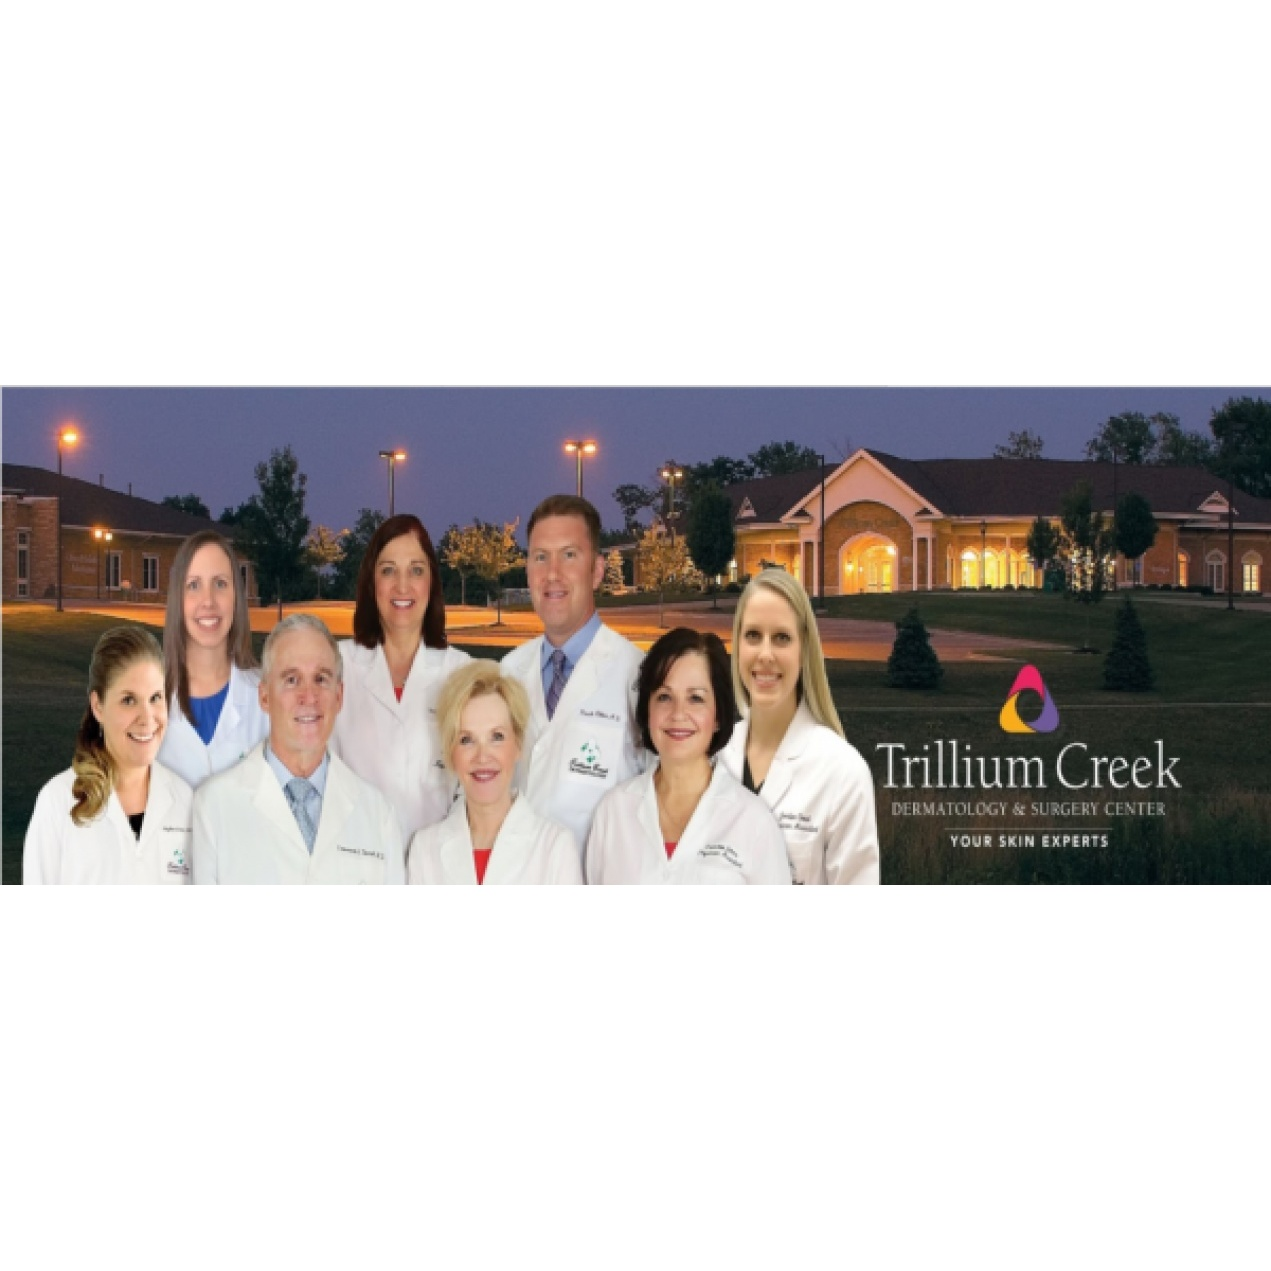 Trillium Creek Dermatology & Surgery Center